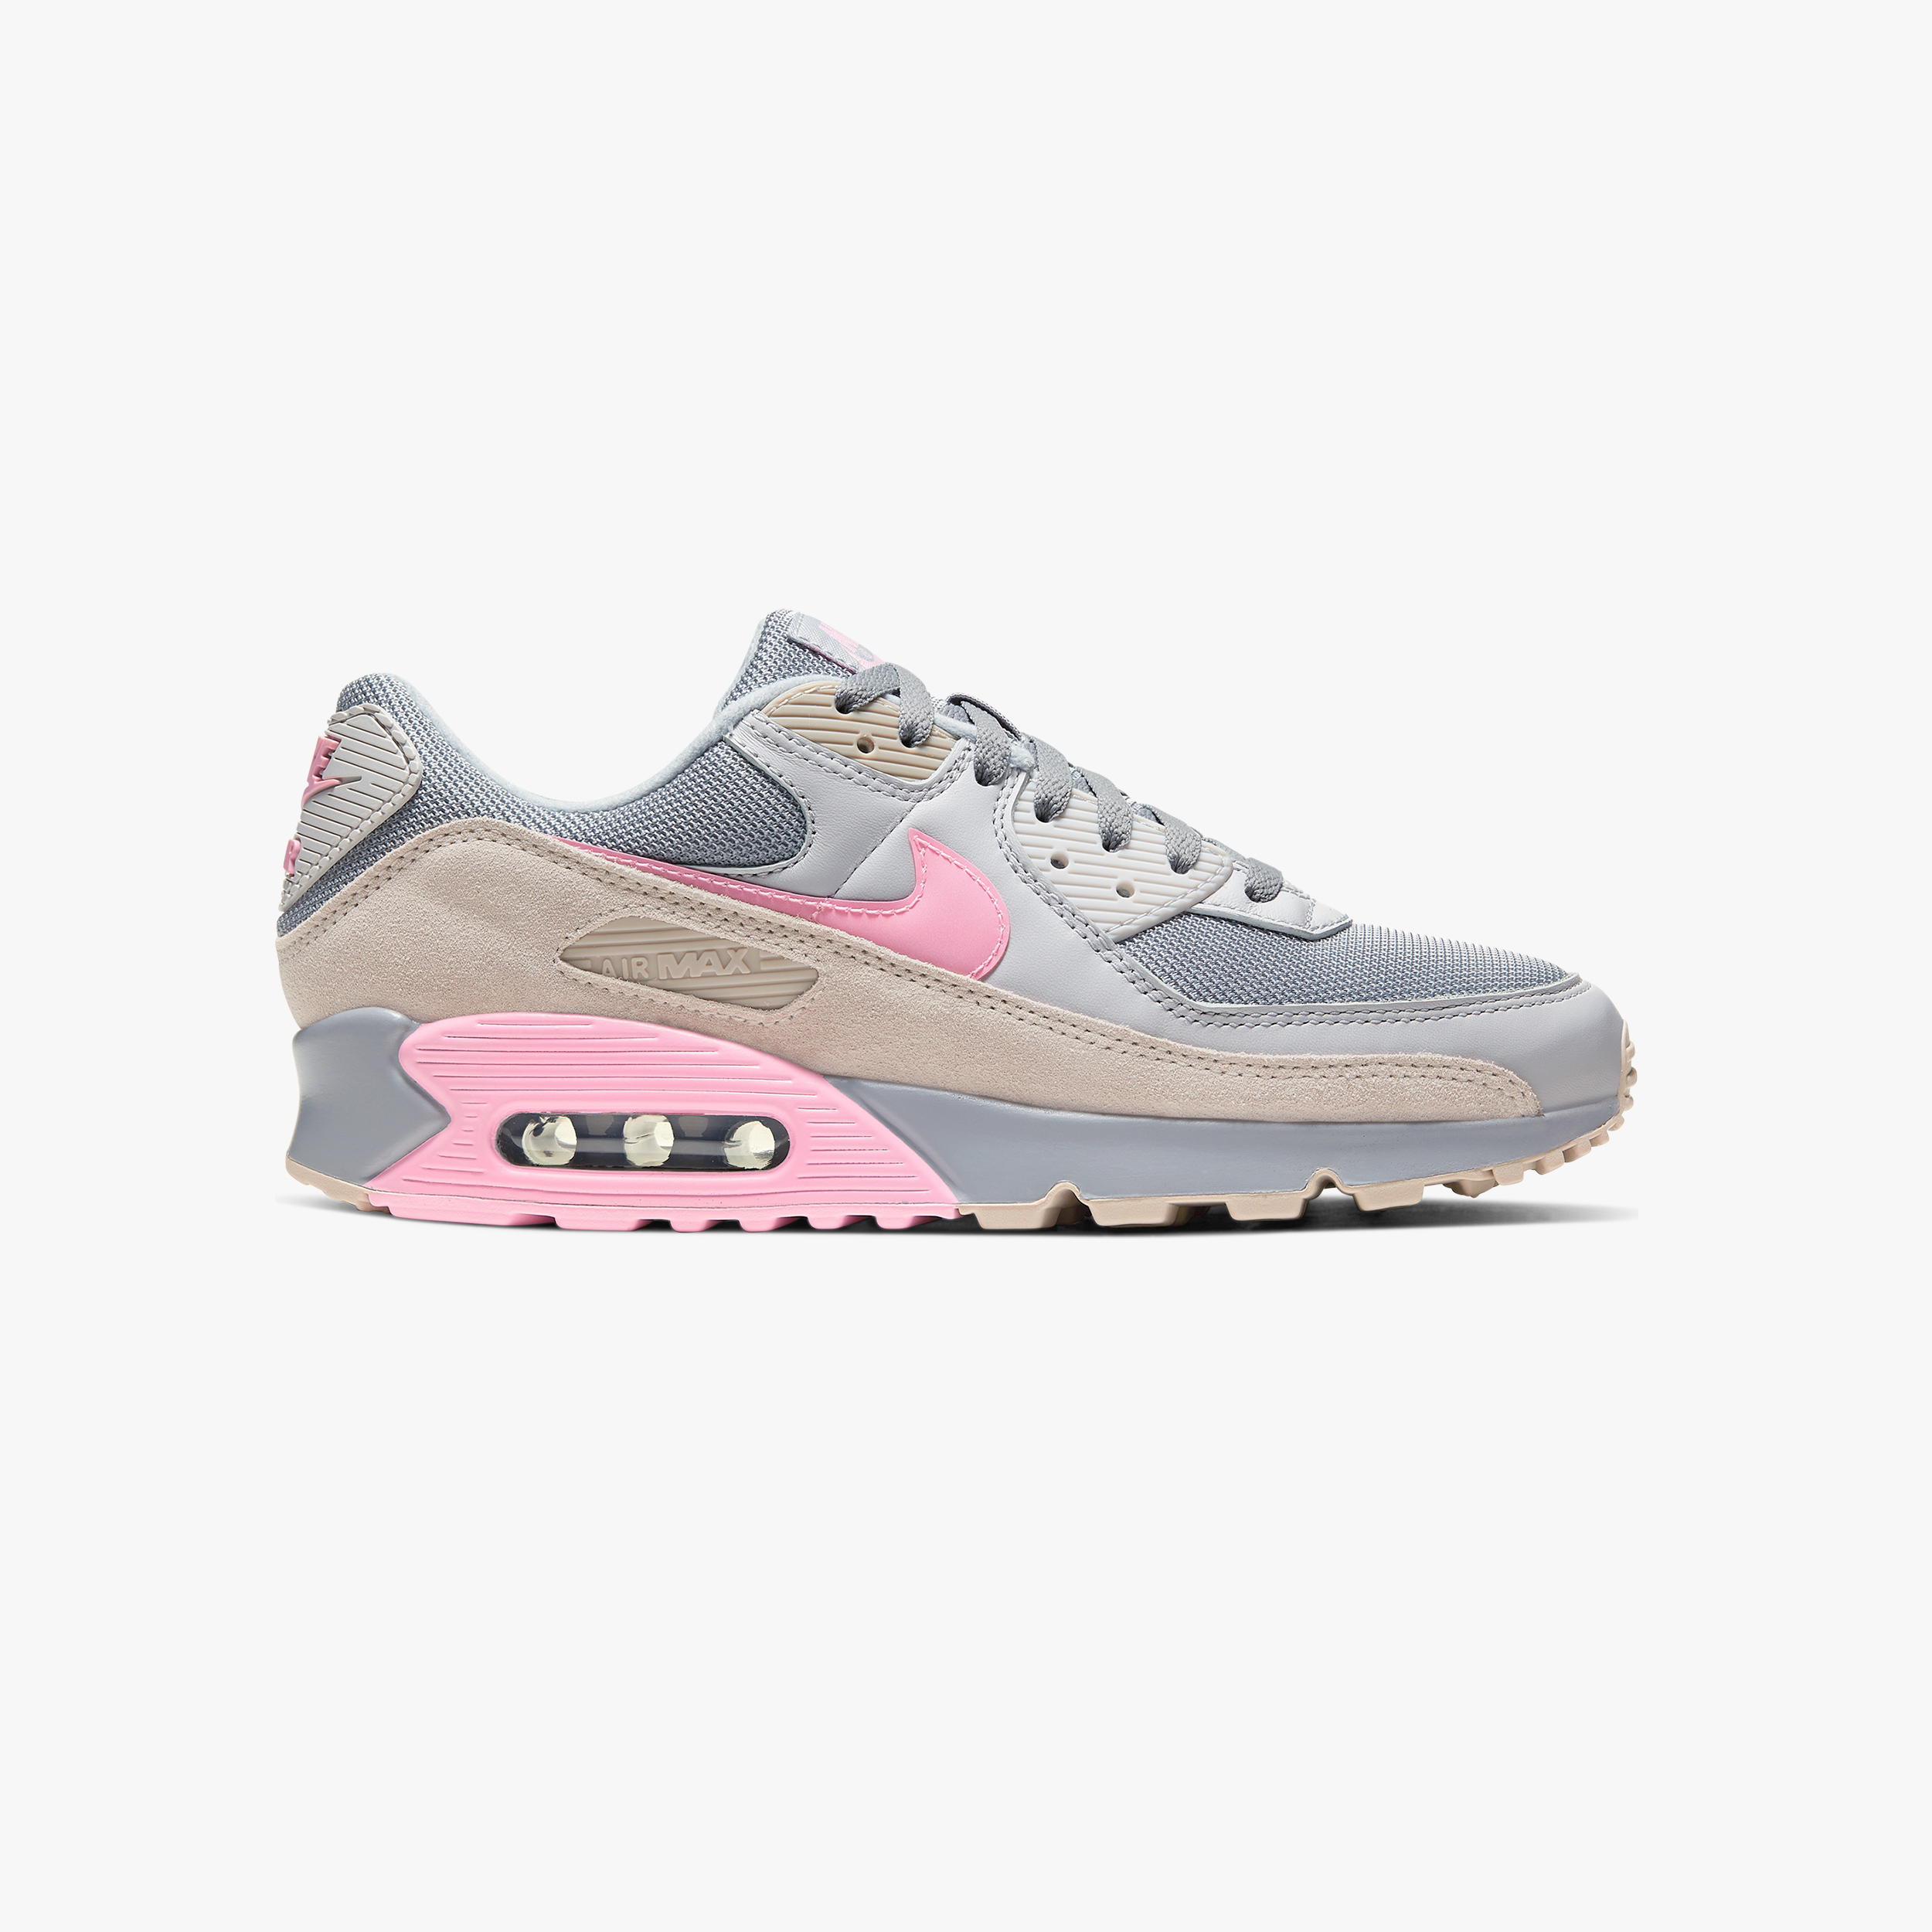 Nike Air Max 90 CSS - Cw7483-001 - SNS | sneakers & streetwear ...